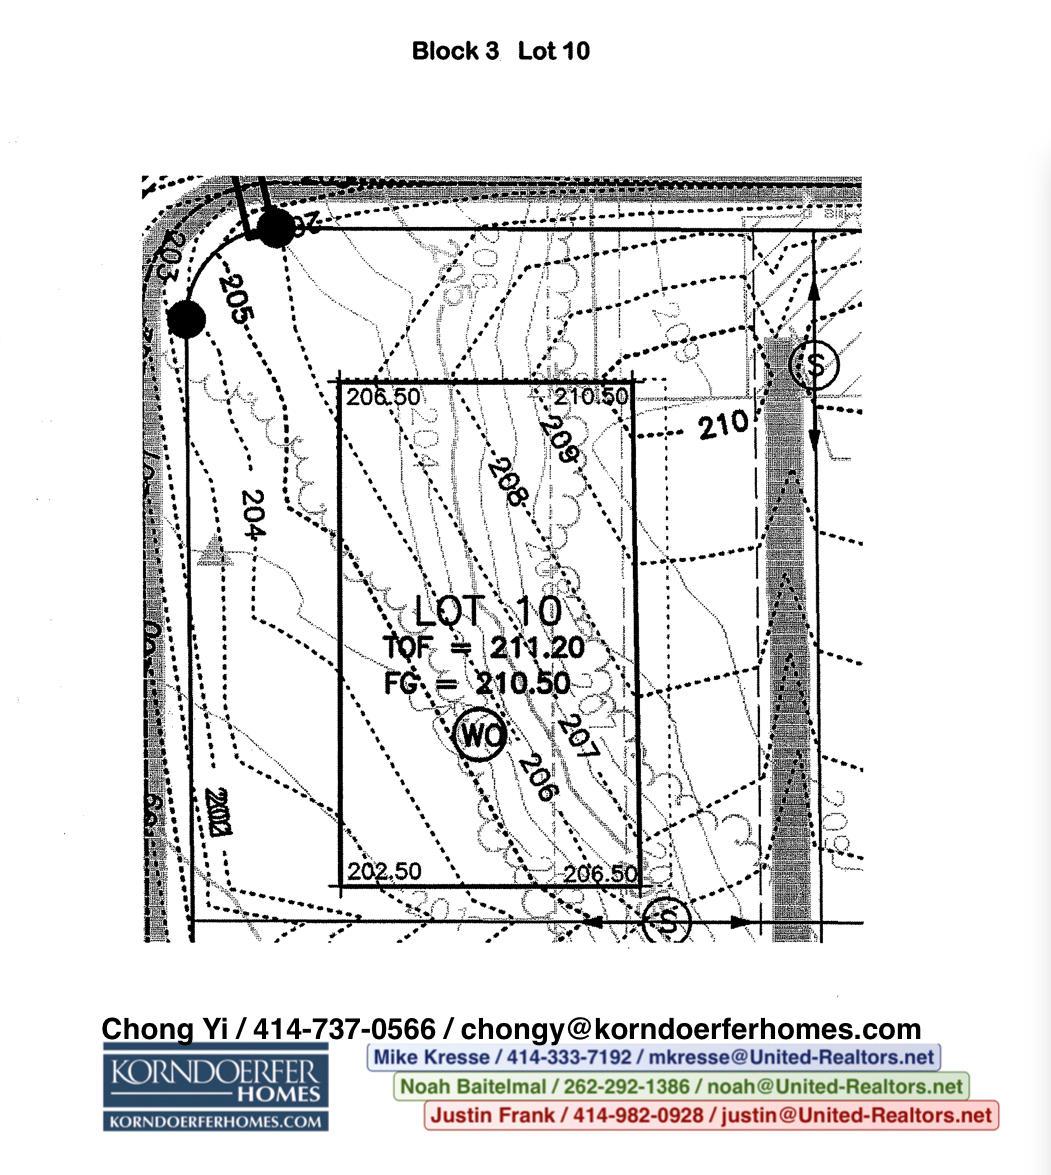 8656 N 117th St Milwaukee Wi 53224 Mls 1608288 Keefe Real Estate F G Block Diagram